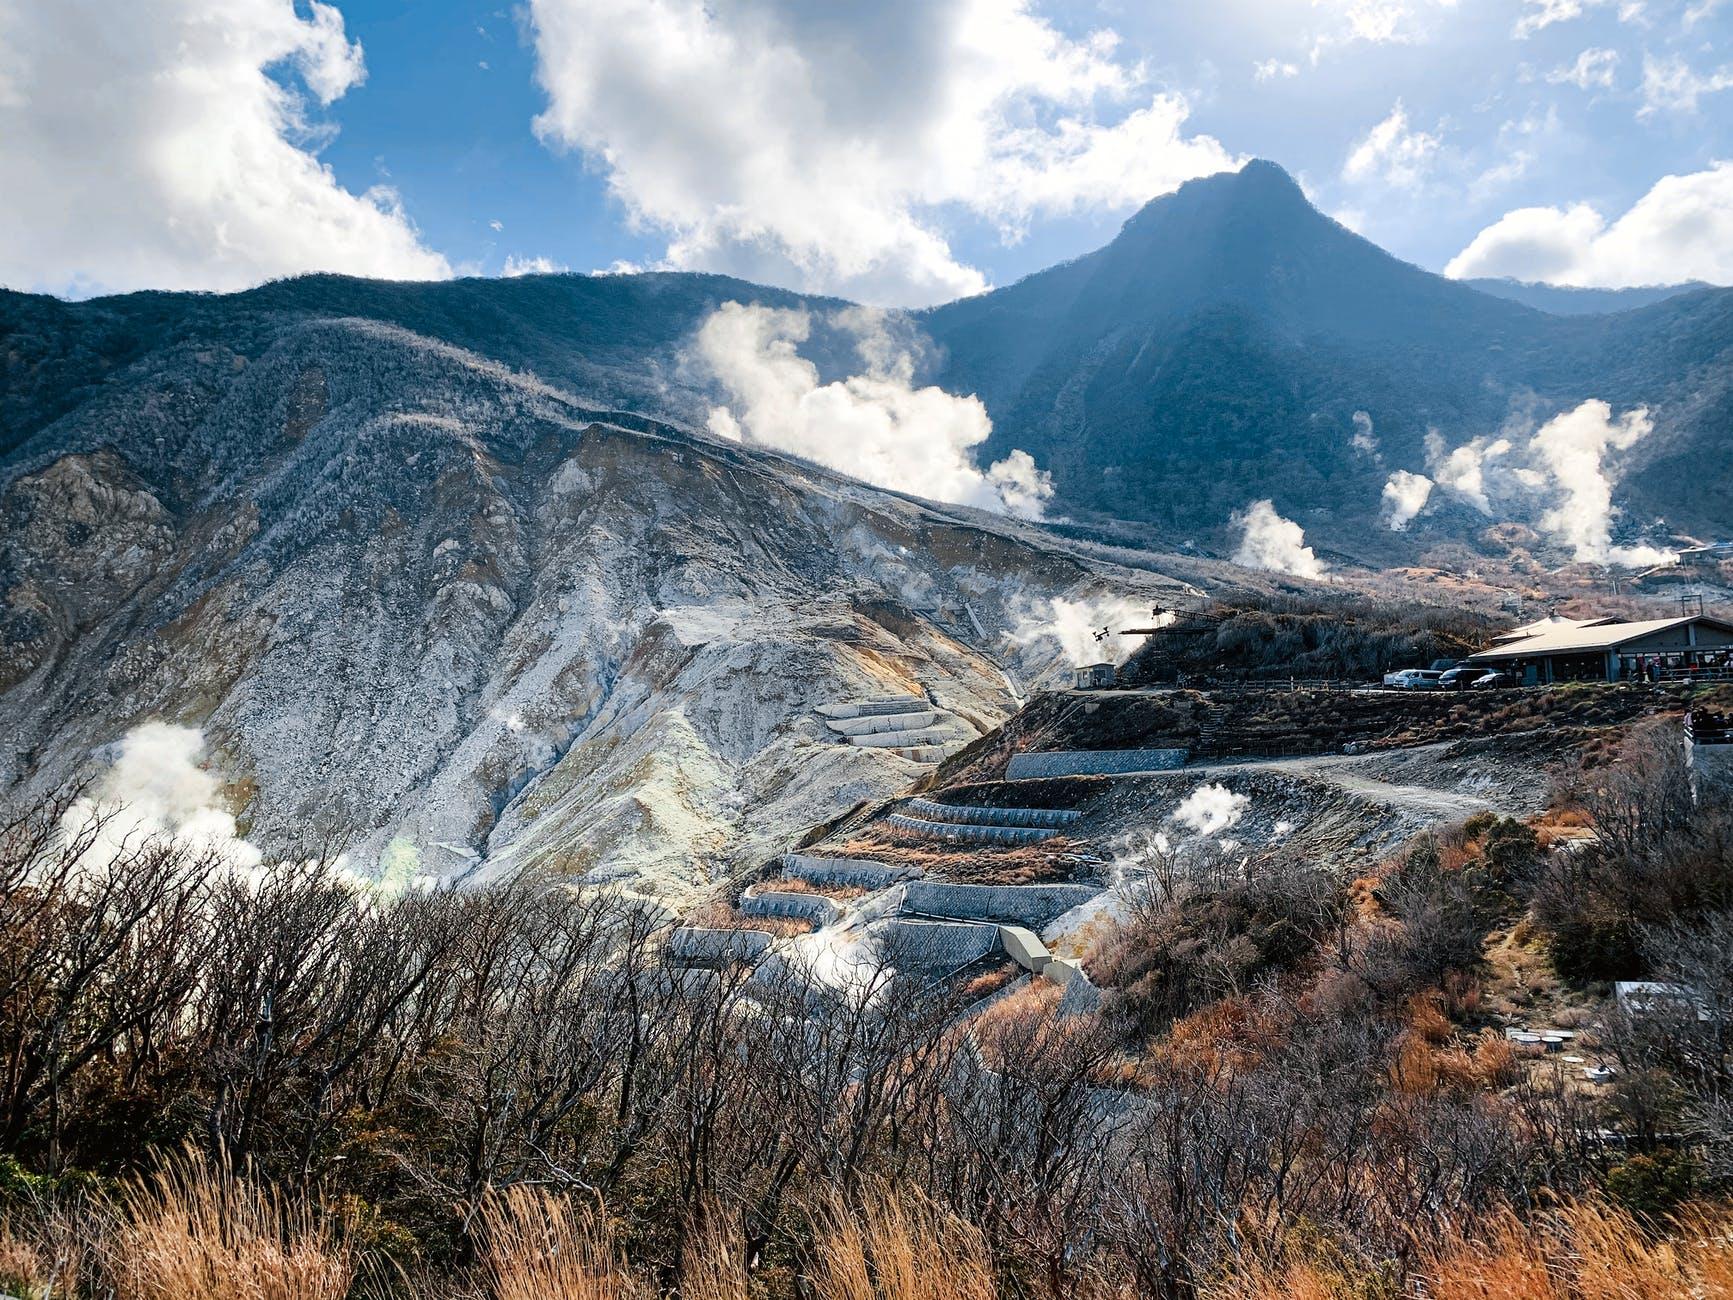 volcanic mountainous terrain with smokingfumes